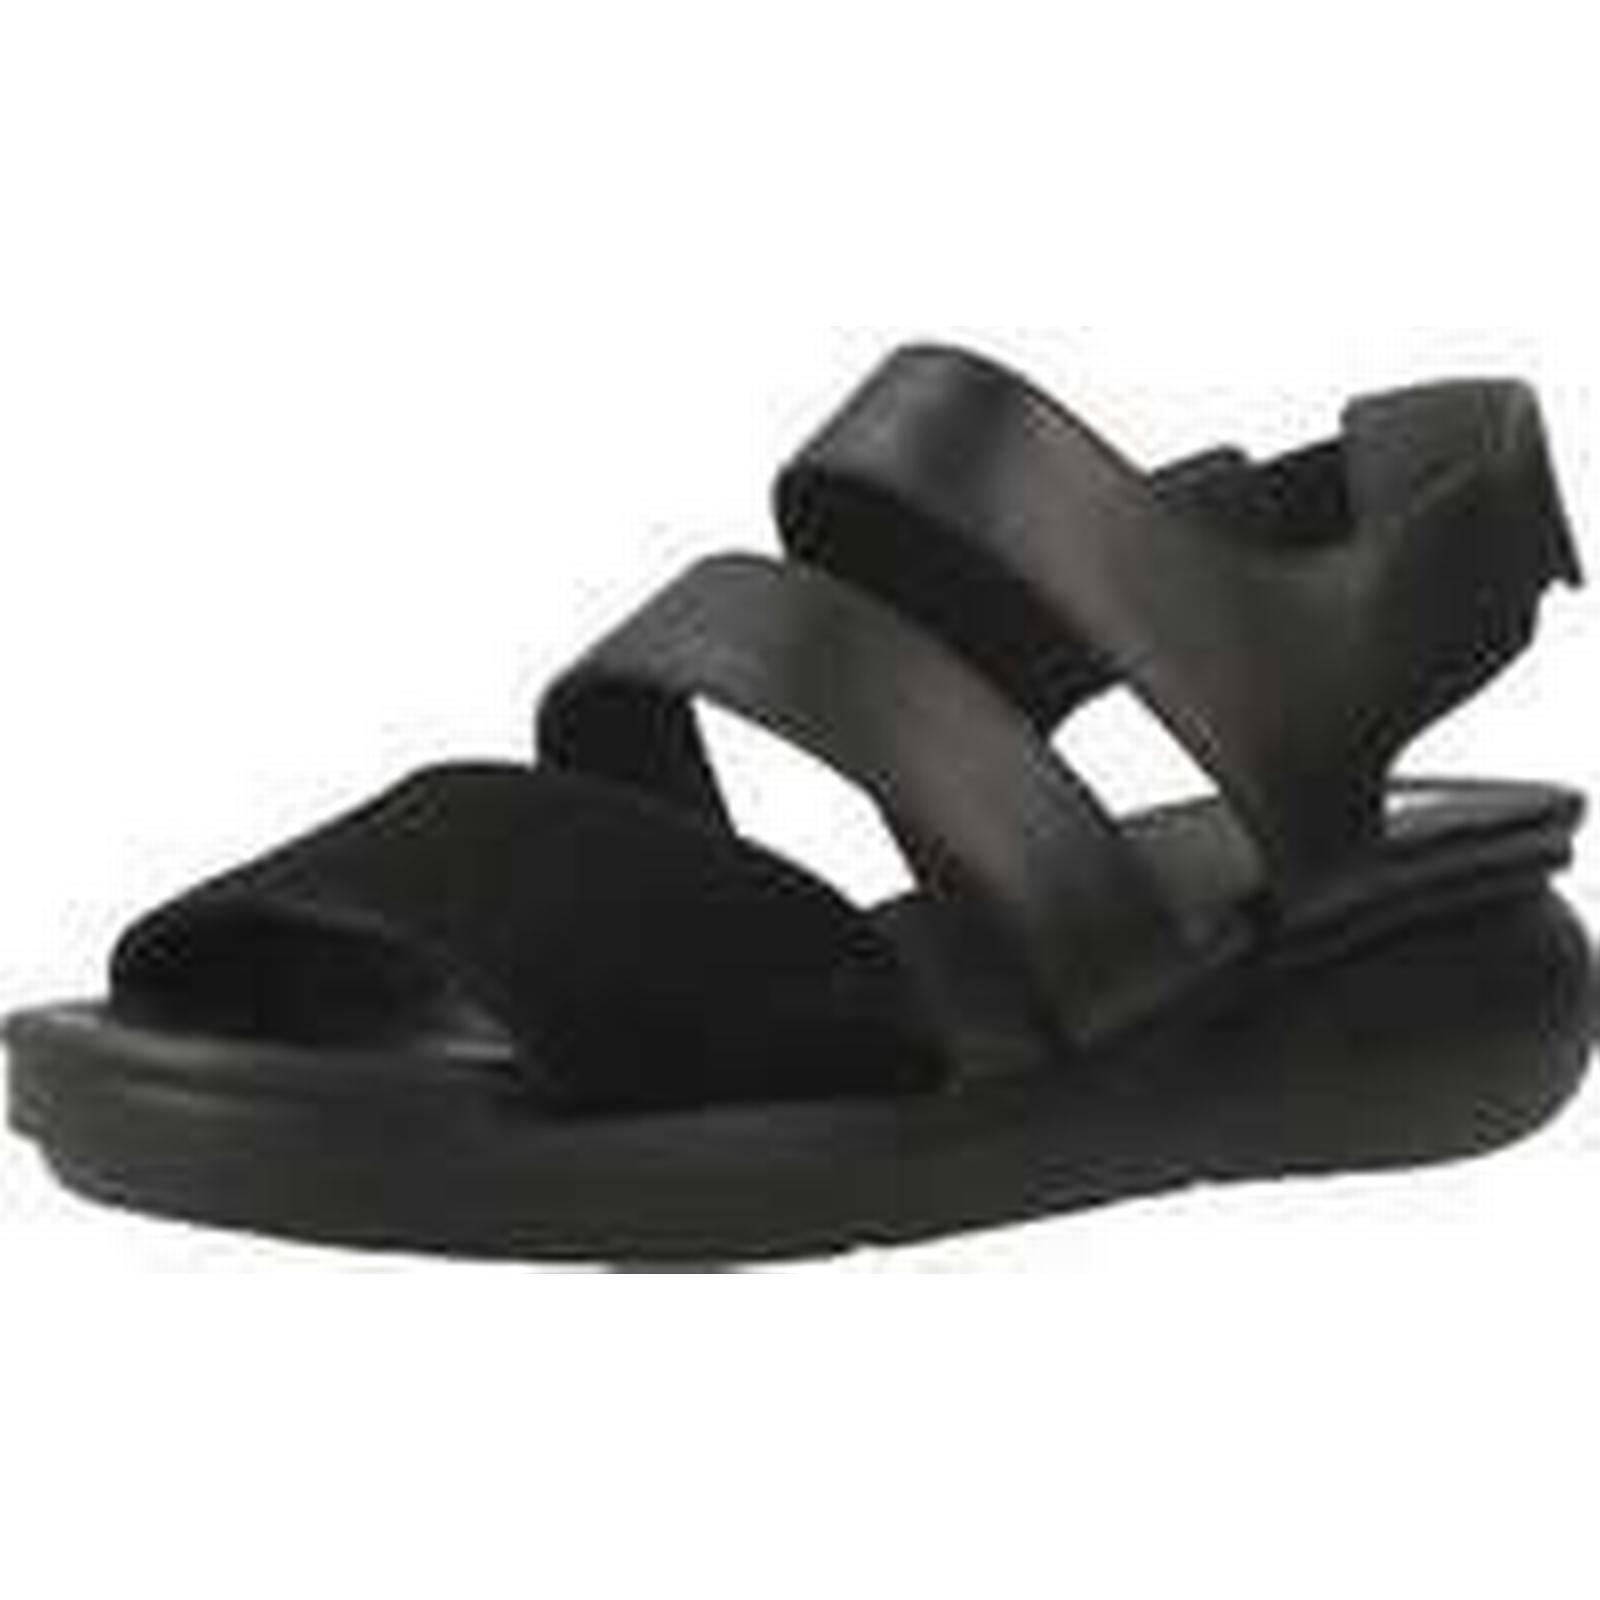 Spartoo.co.uk Camper BALLON Sandals women's Sandals BALLON in Black 4427f7